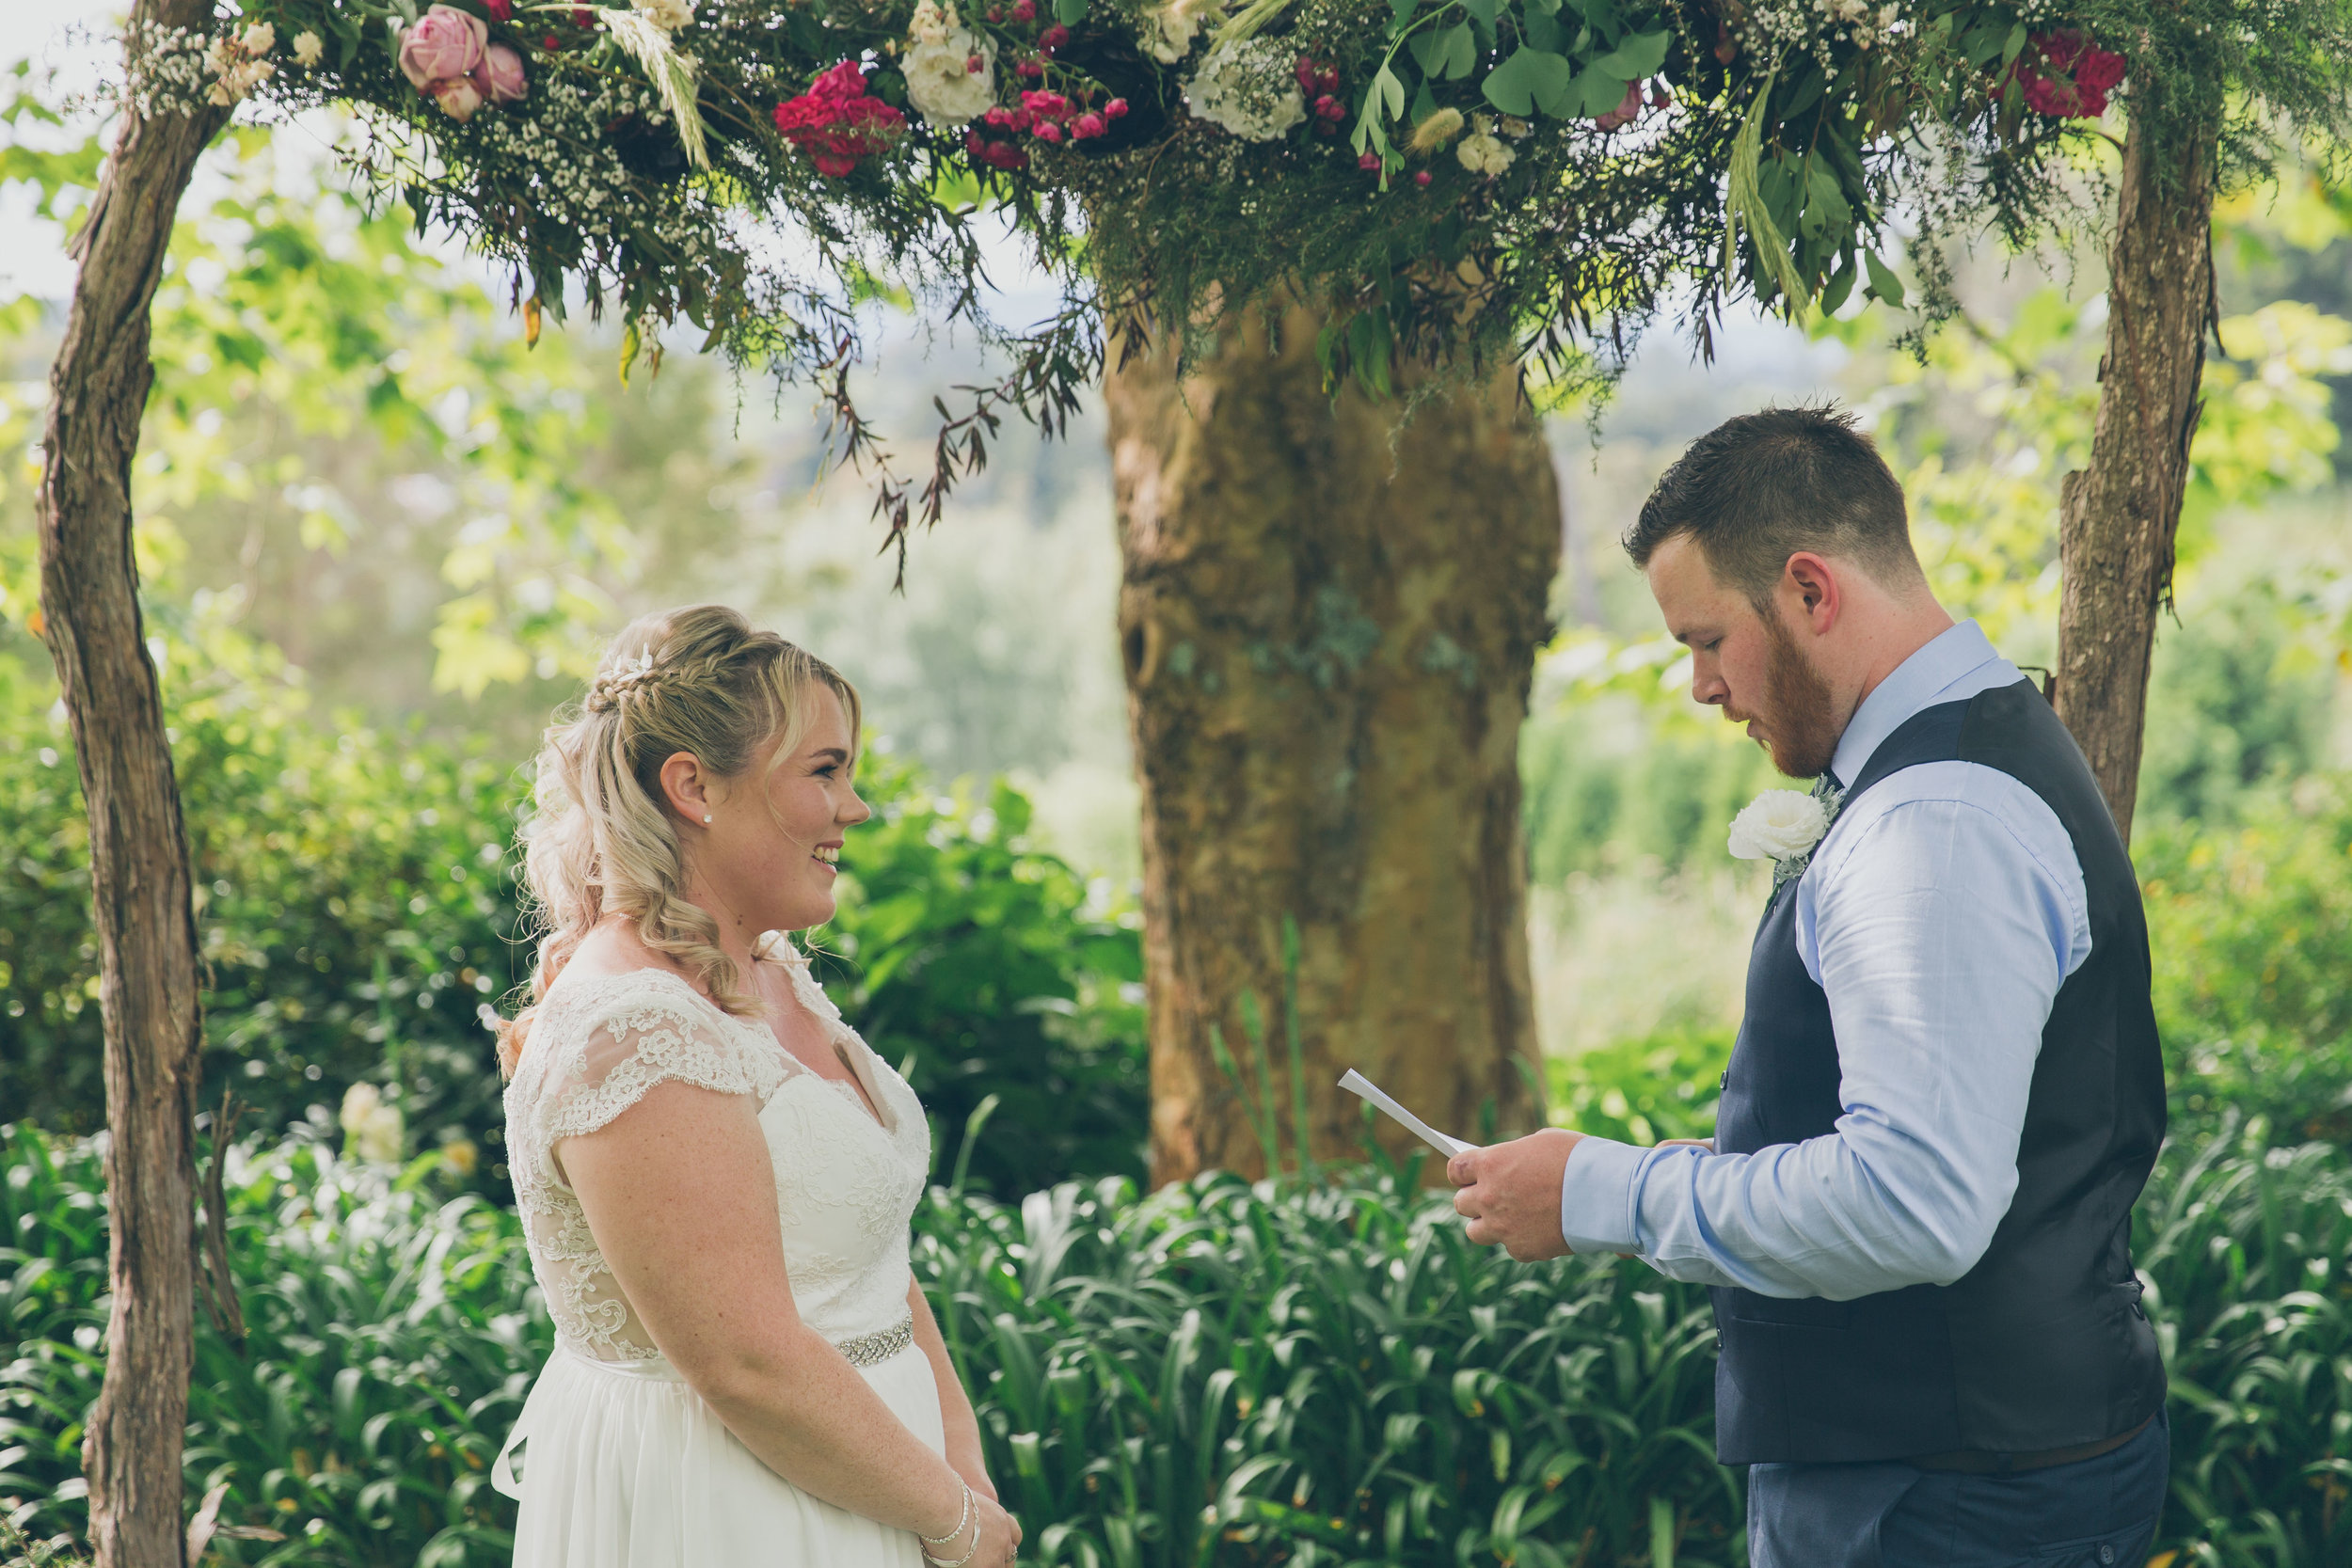 K & S - Wedding - Oh Joy! Photography - Tauranga, New Zealand-2.jpg